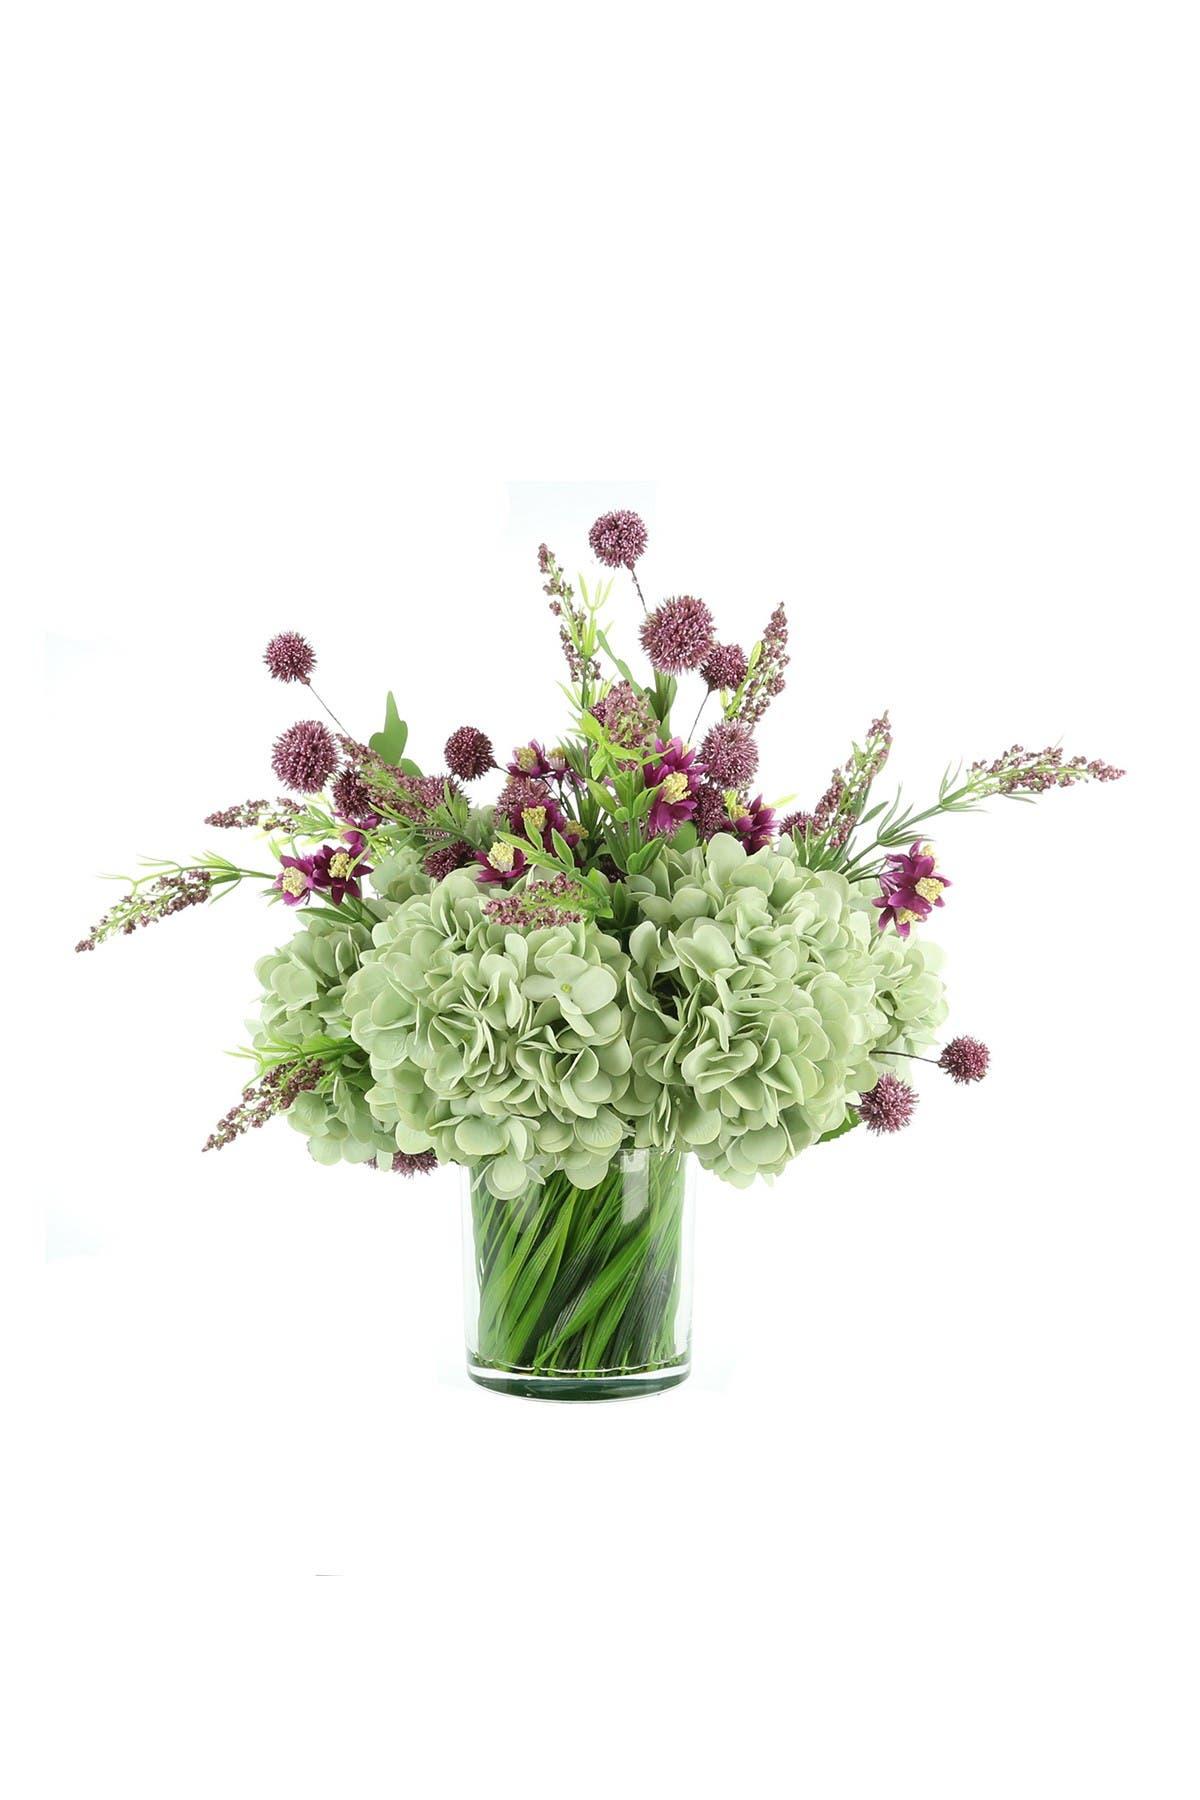 "Image of Willow Row Flower Arrangement w/ Mauve Pompom Balls, Teal Hydrangea, & Purple Wild Heather in Glass Vase w/ Decorative Grass, 22"" L x 20"" H"